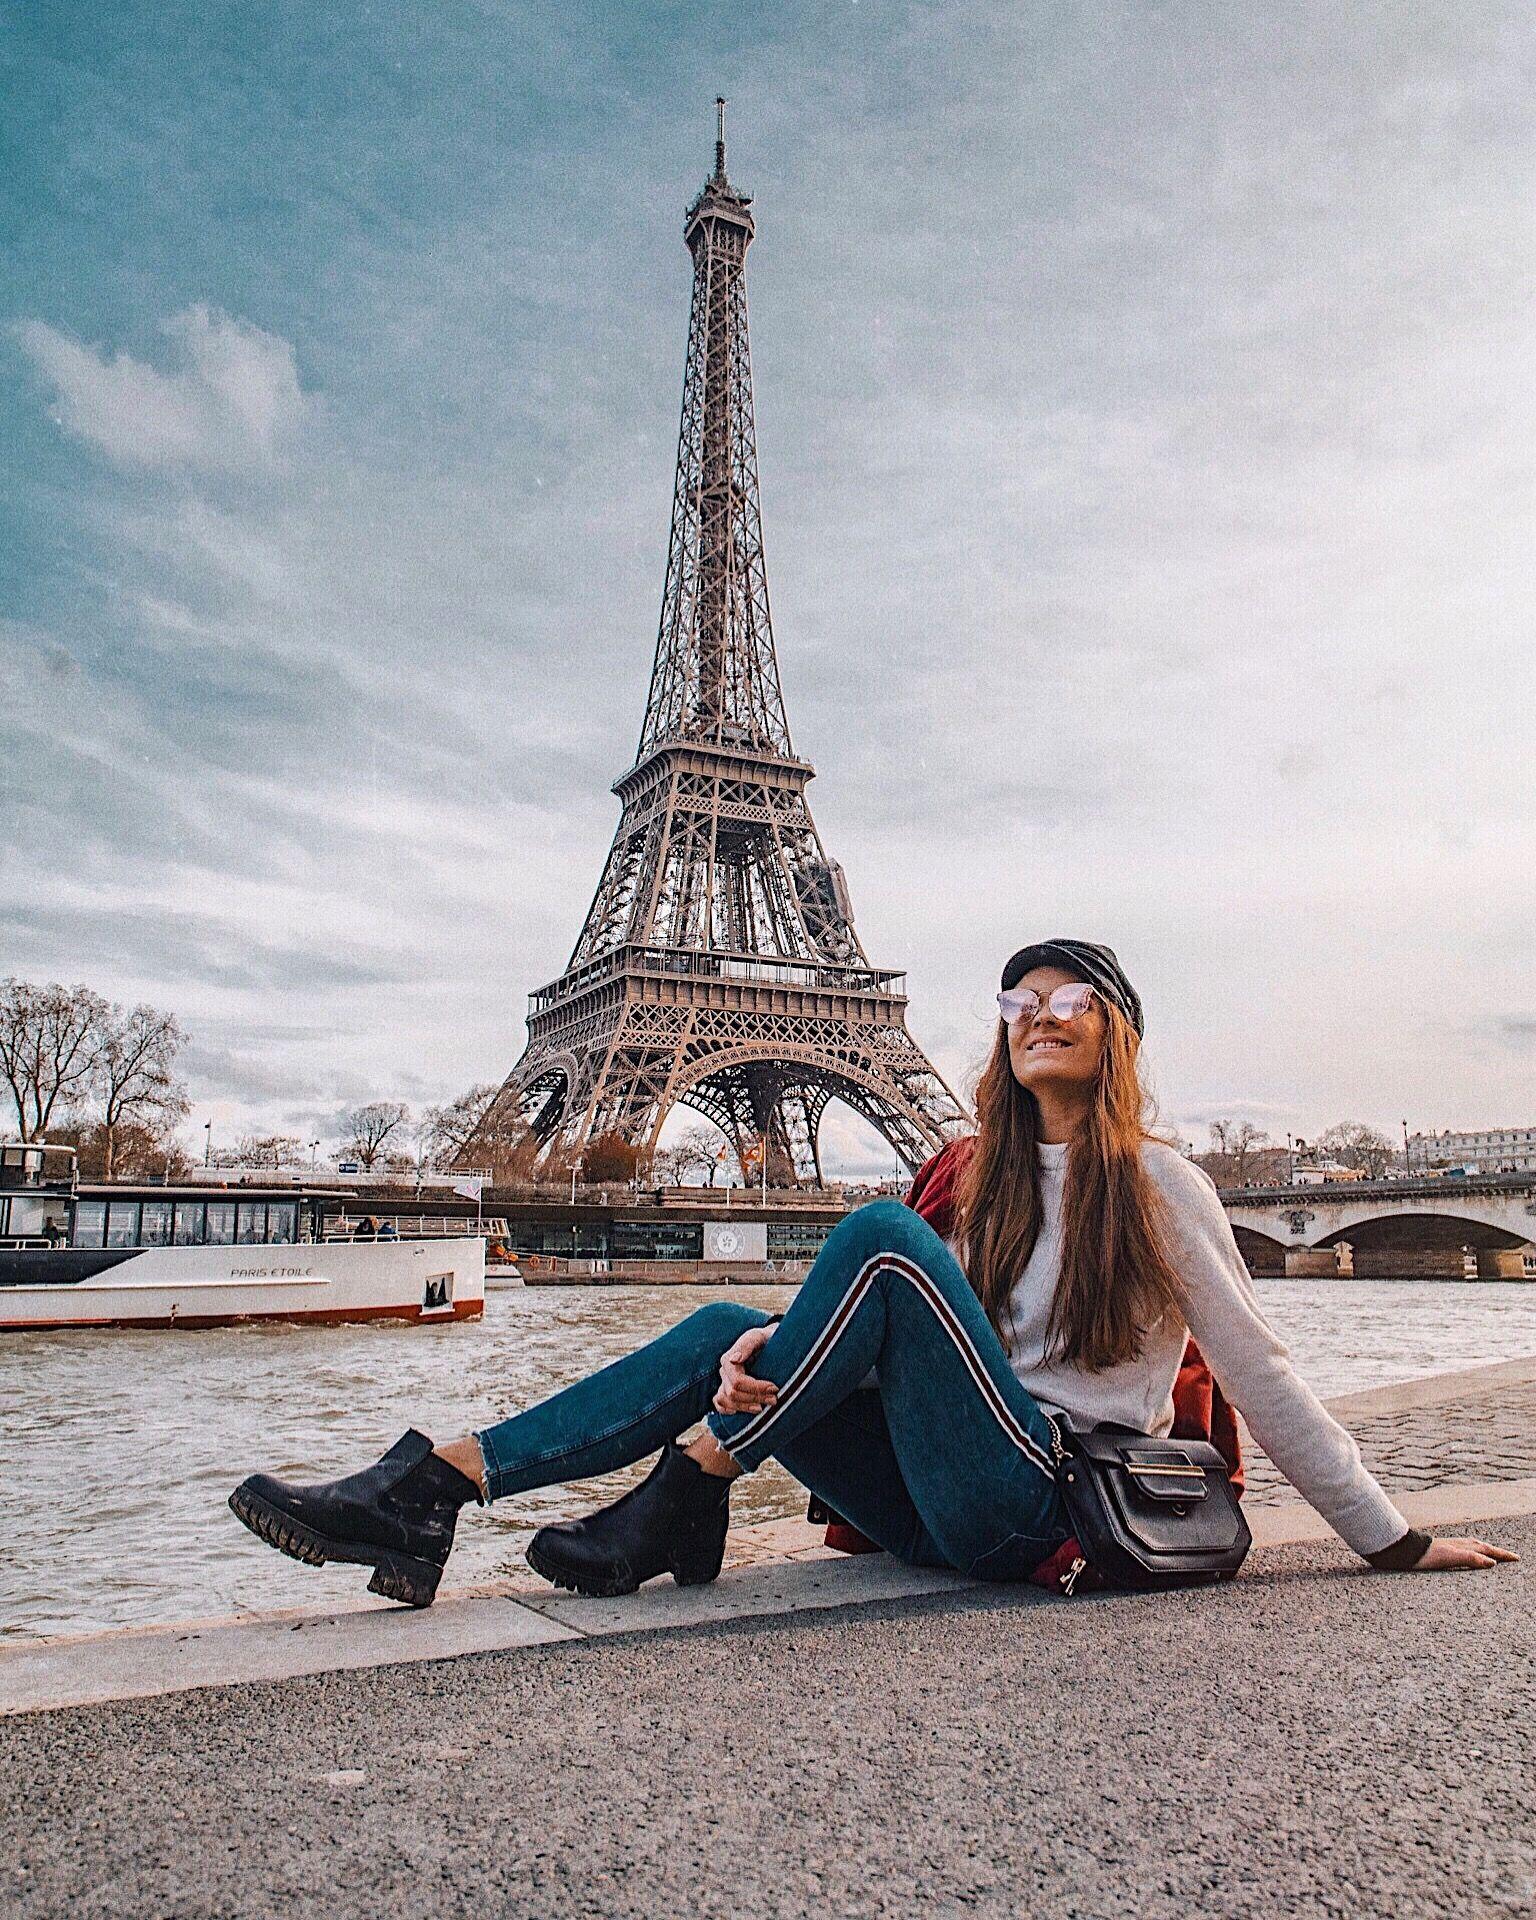 Pin by Bella Ghirardo on Paris 2020 in 2020 Paris france